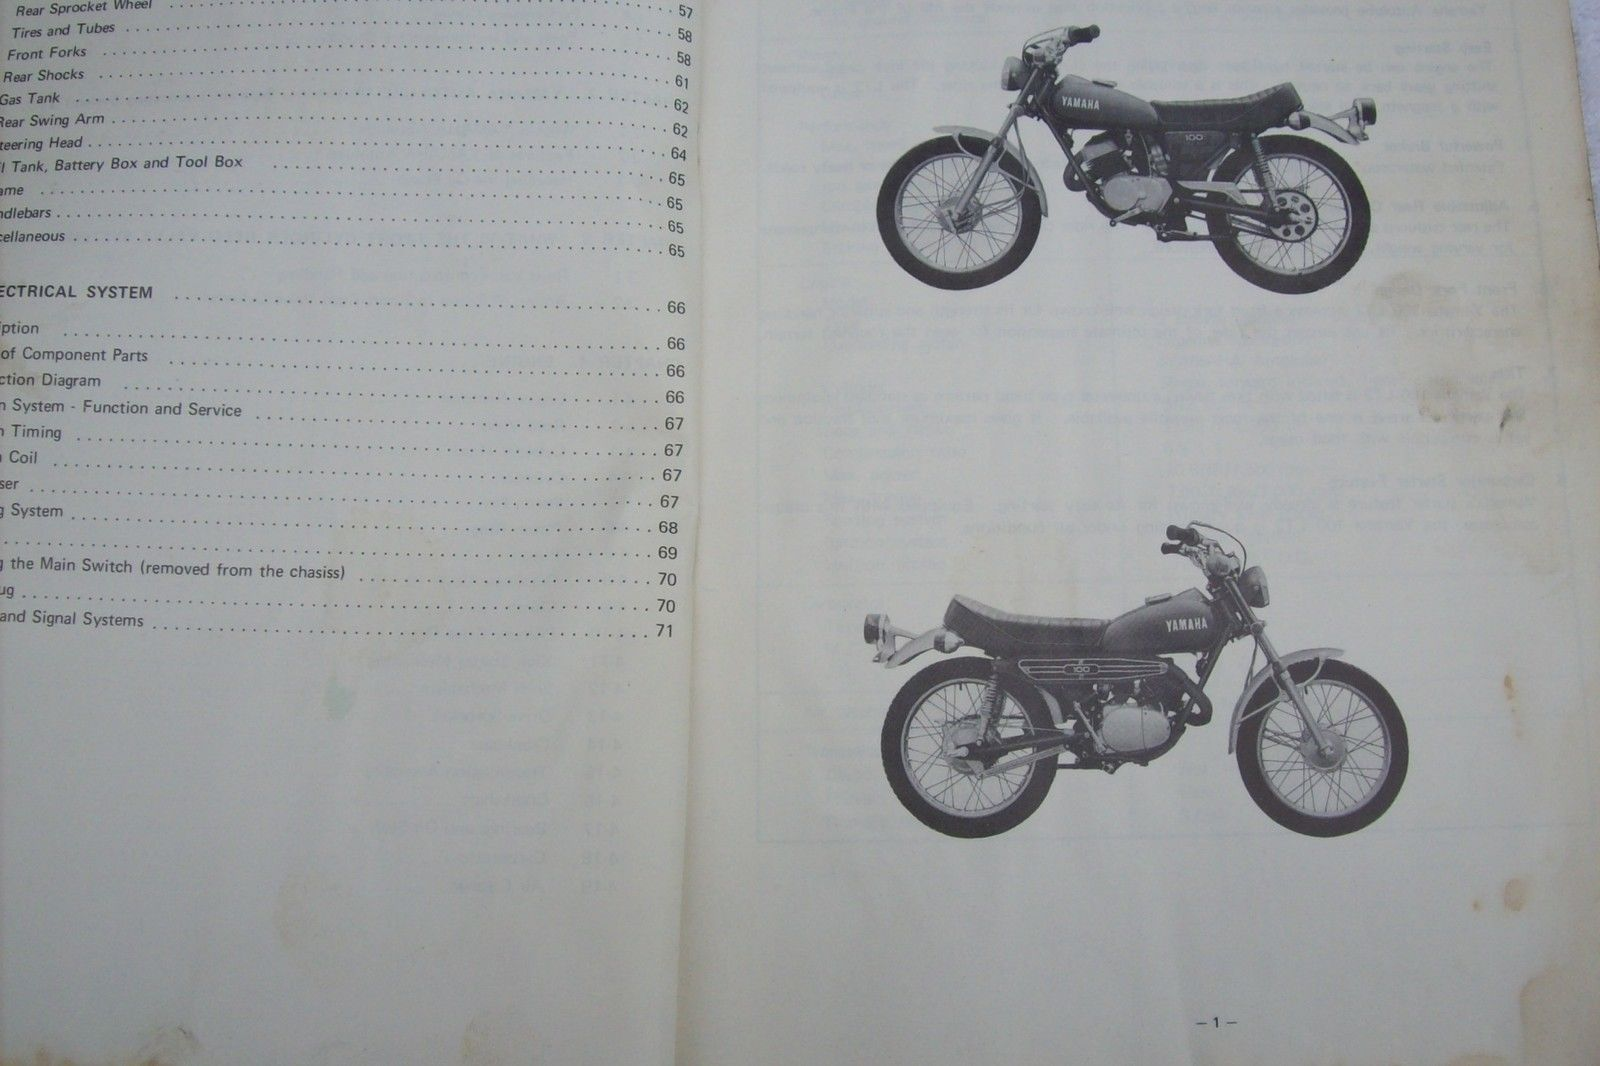 yamaha Array - 72 yamaha service manual lt2 100 enduro vintage bike parts  ahrma mx rh pinterest